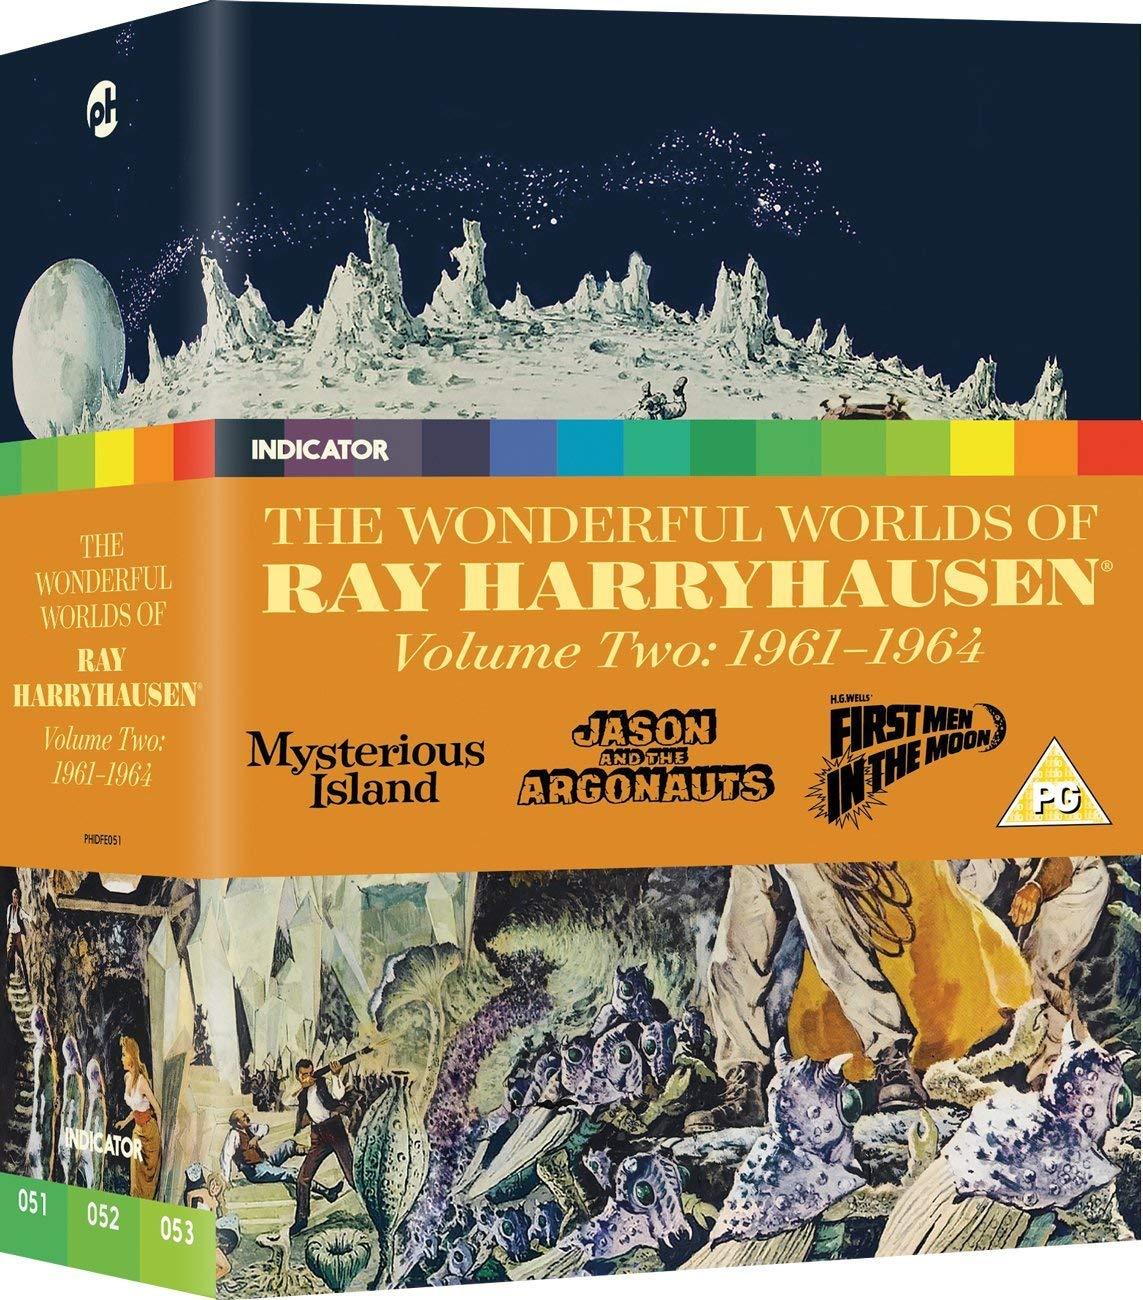 The Wonderful Worlds of Ray Harryhausen - Volume Two: 1961-1964 [Blu-ray]